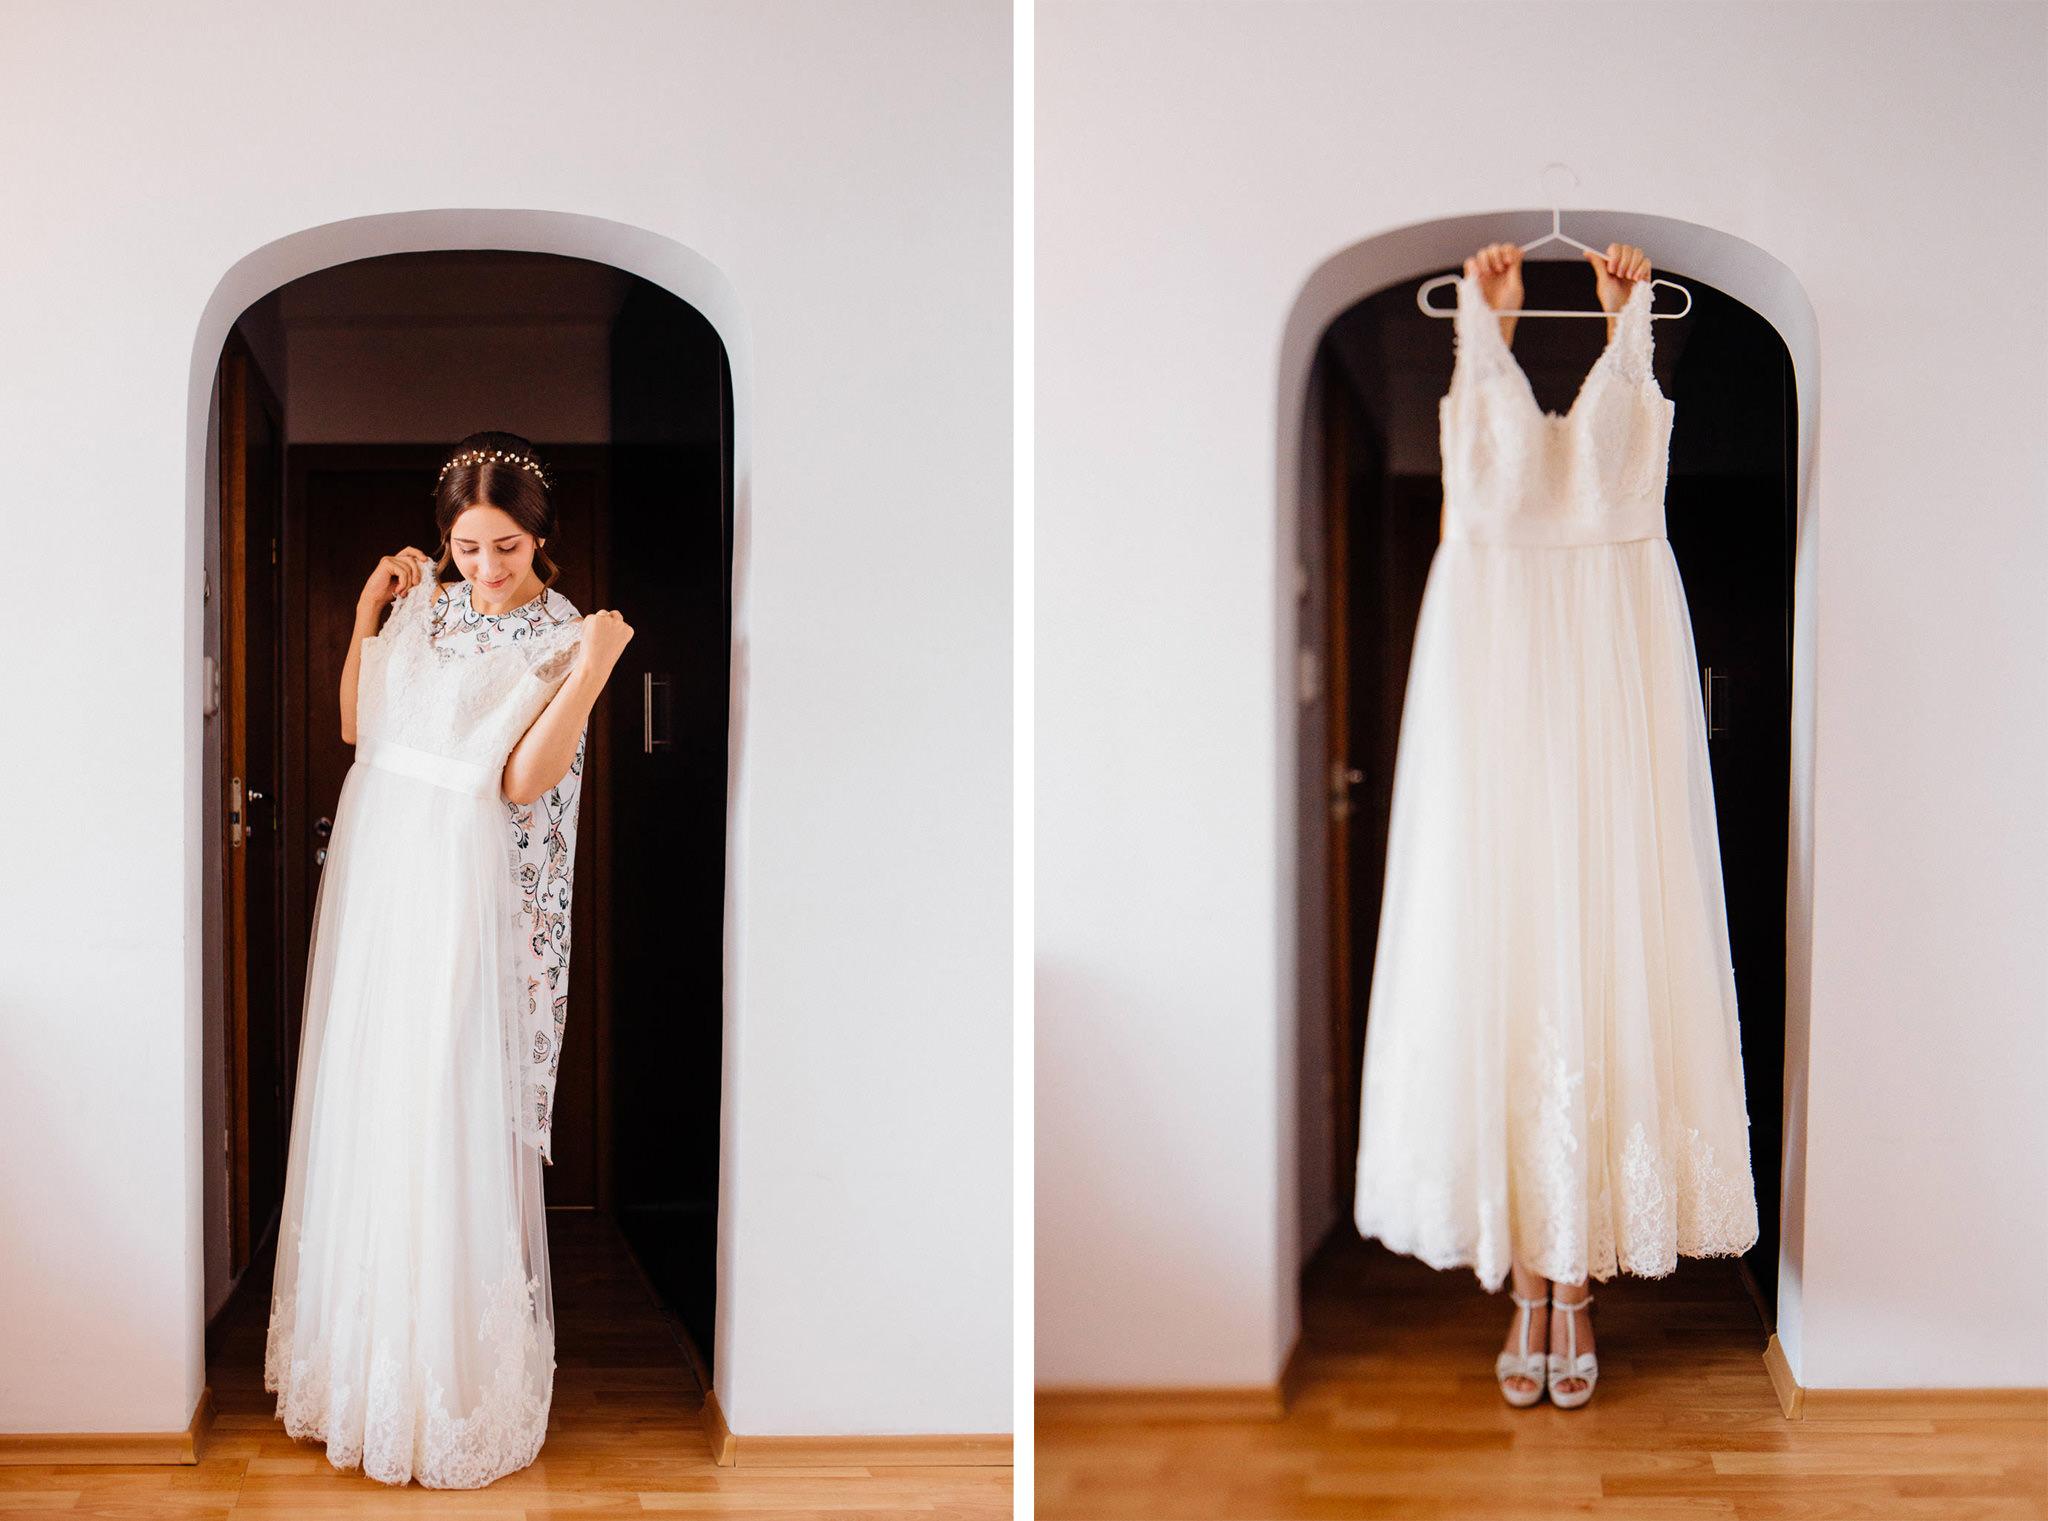 Beniamin-&-Ana-fotograf-nunta-vintage-Bucuresti-1027